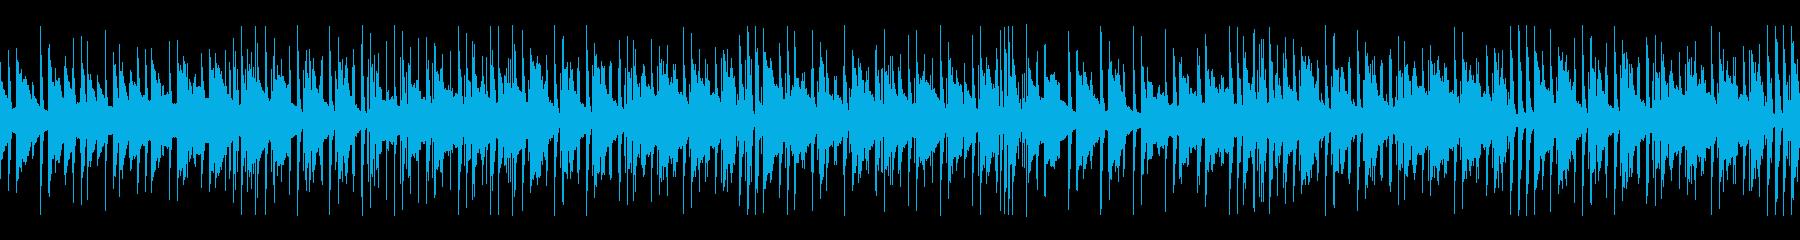 BGM008-01 トランプのカードゲ…の再生済みの波形